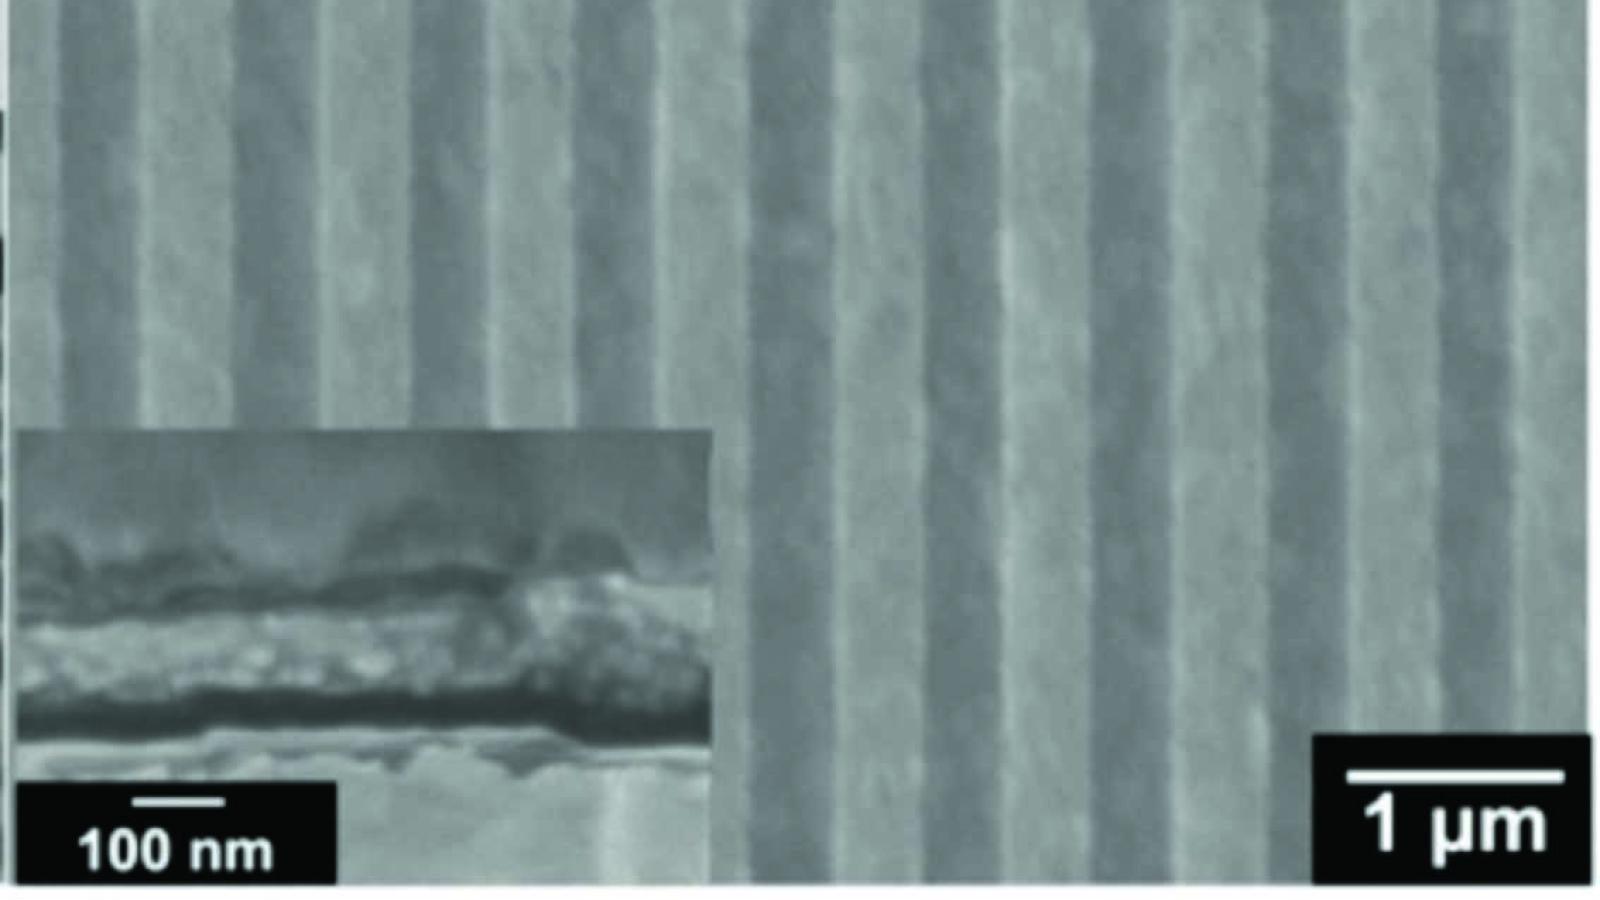 Silver nanograting